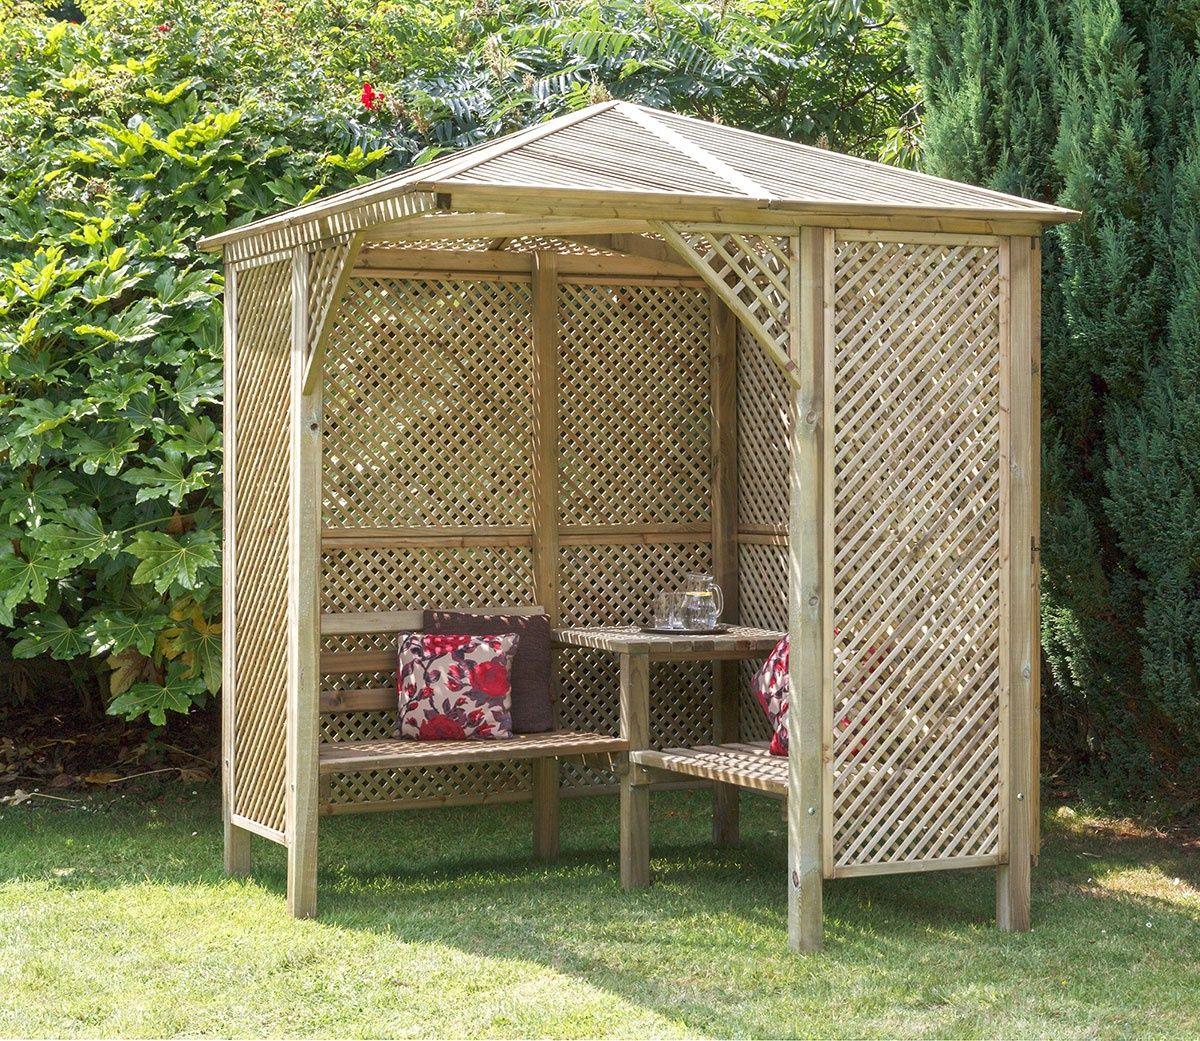 Admirable 45 Garden Arbor Bench Design Ideas Diy Kits You Can Build Bralicious Painted Fabric Chair Ideas Braliciousco